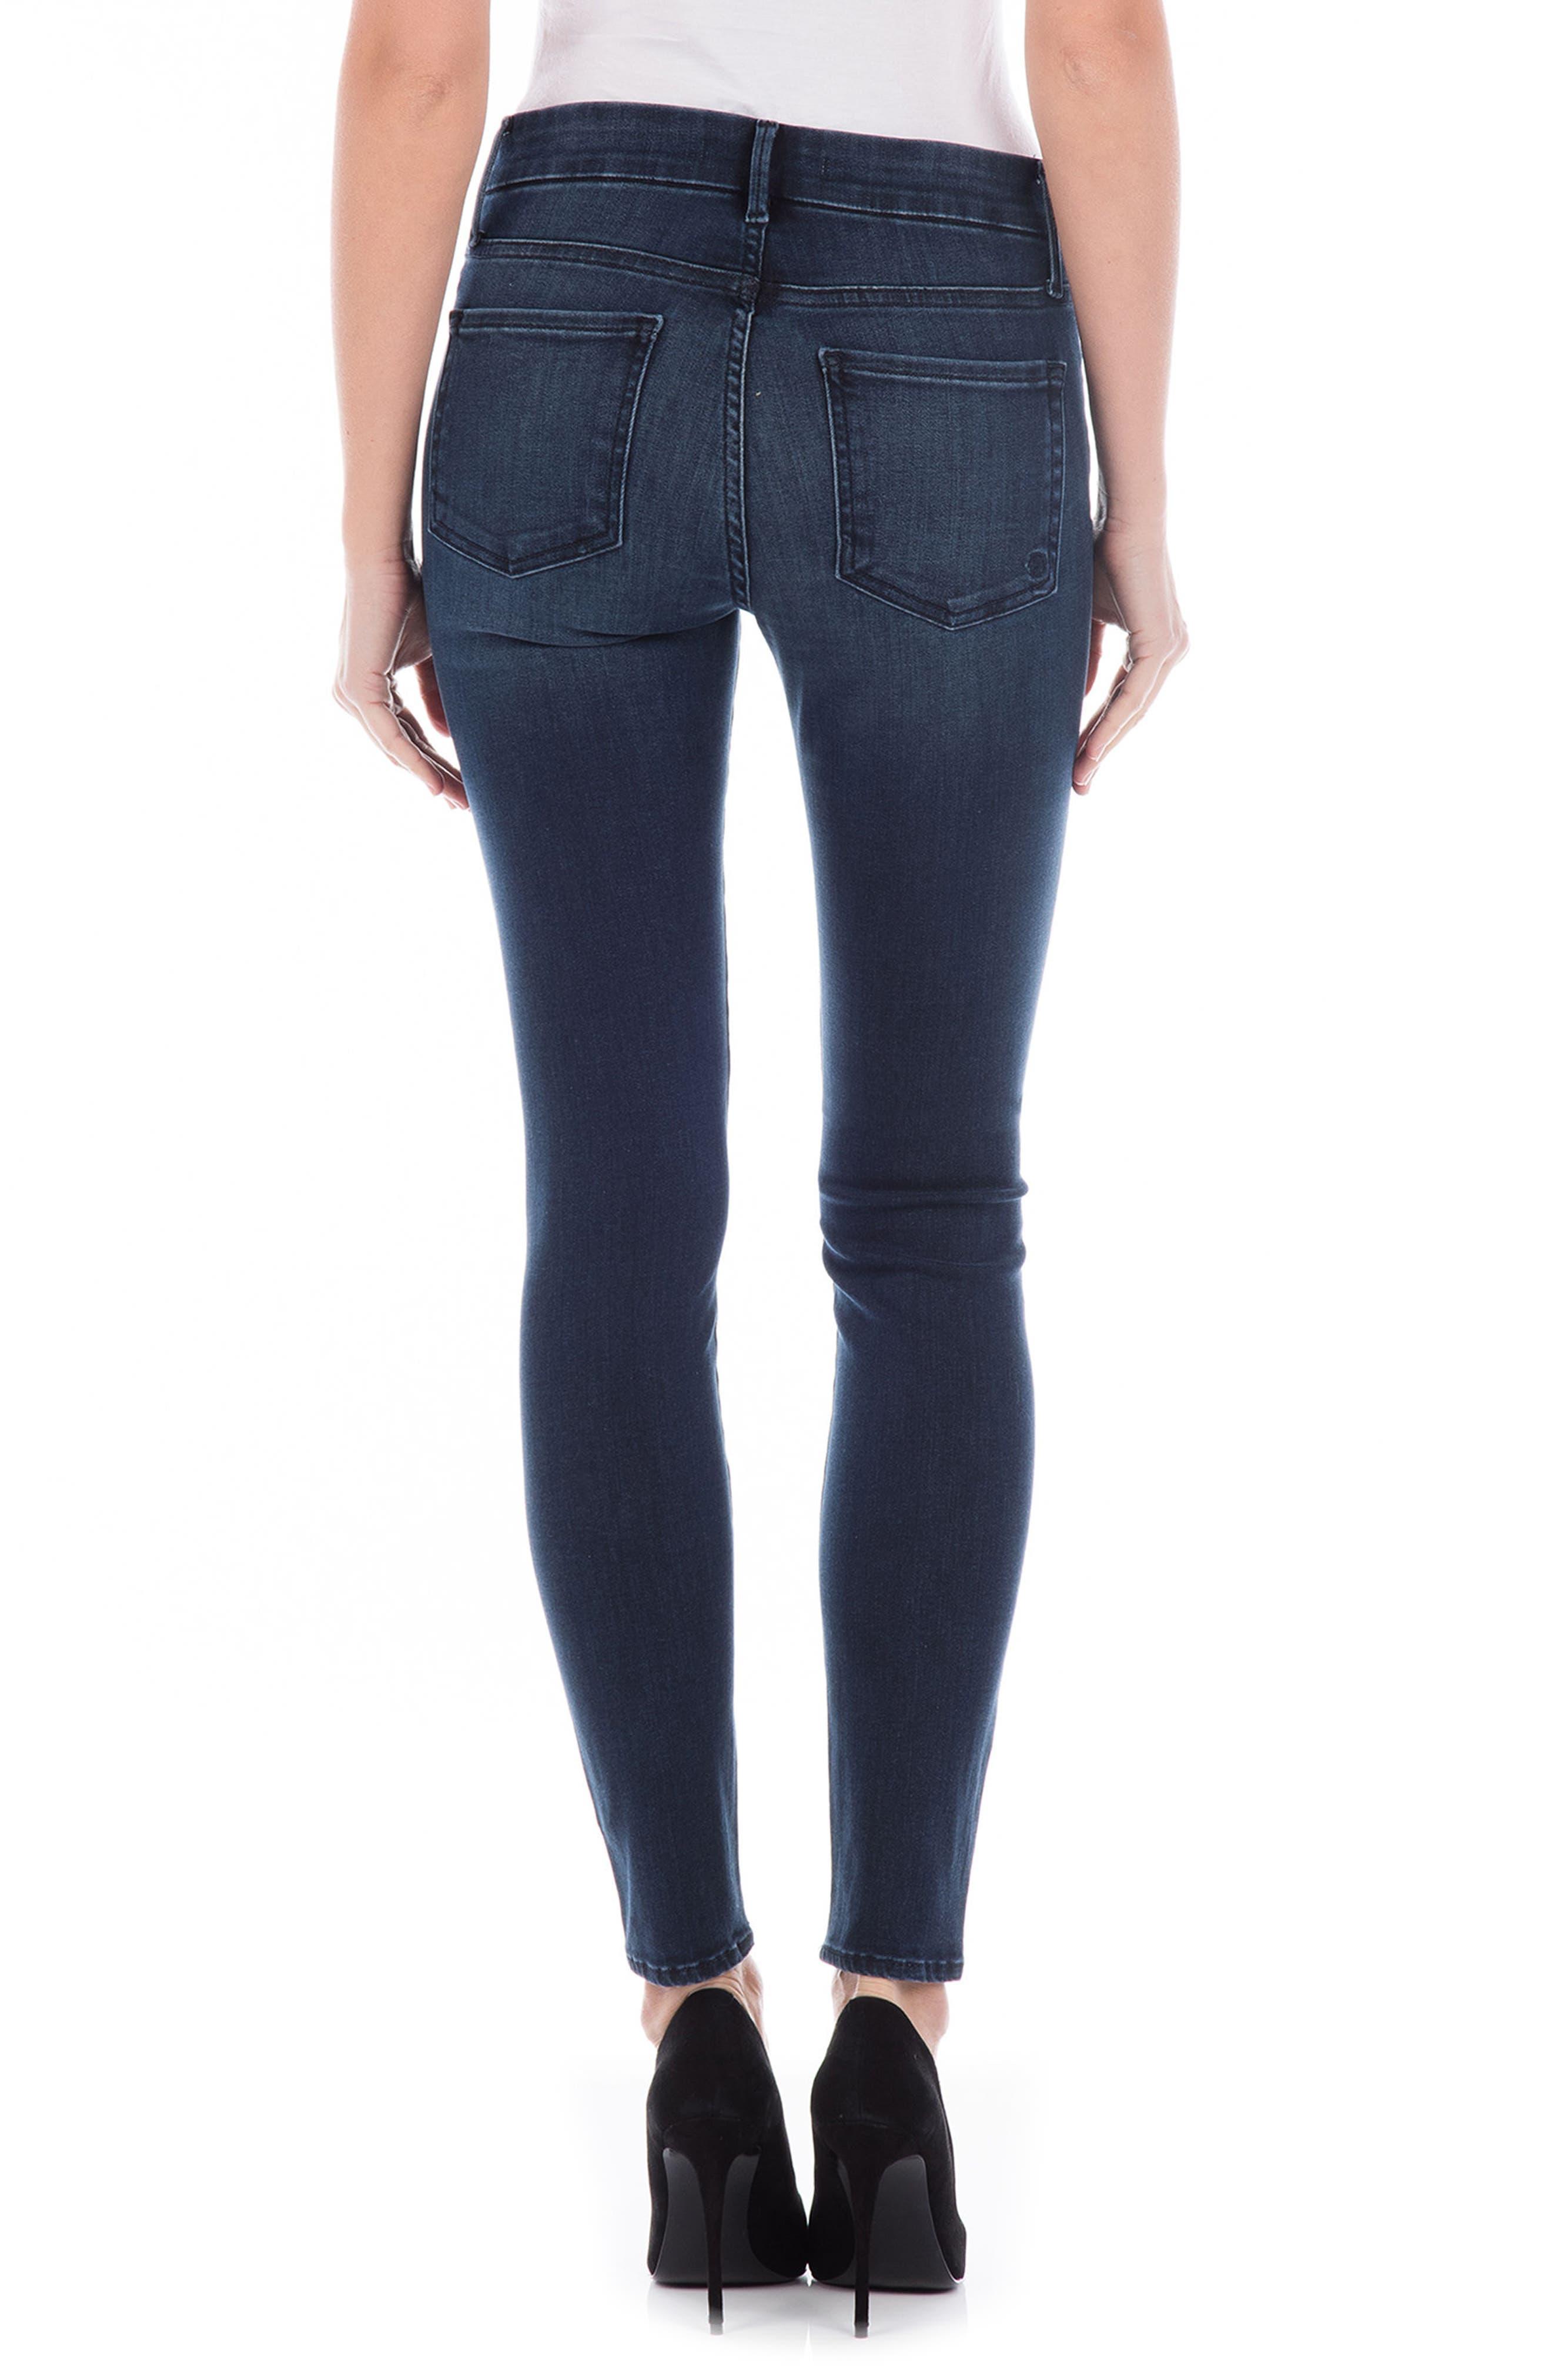 Sola Skinny Jeans,                             Alternate thumbnail 2, color,                             400